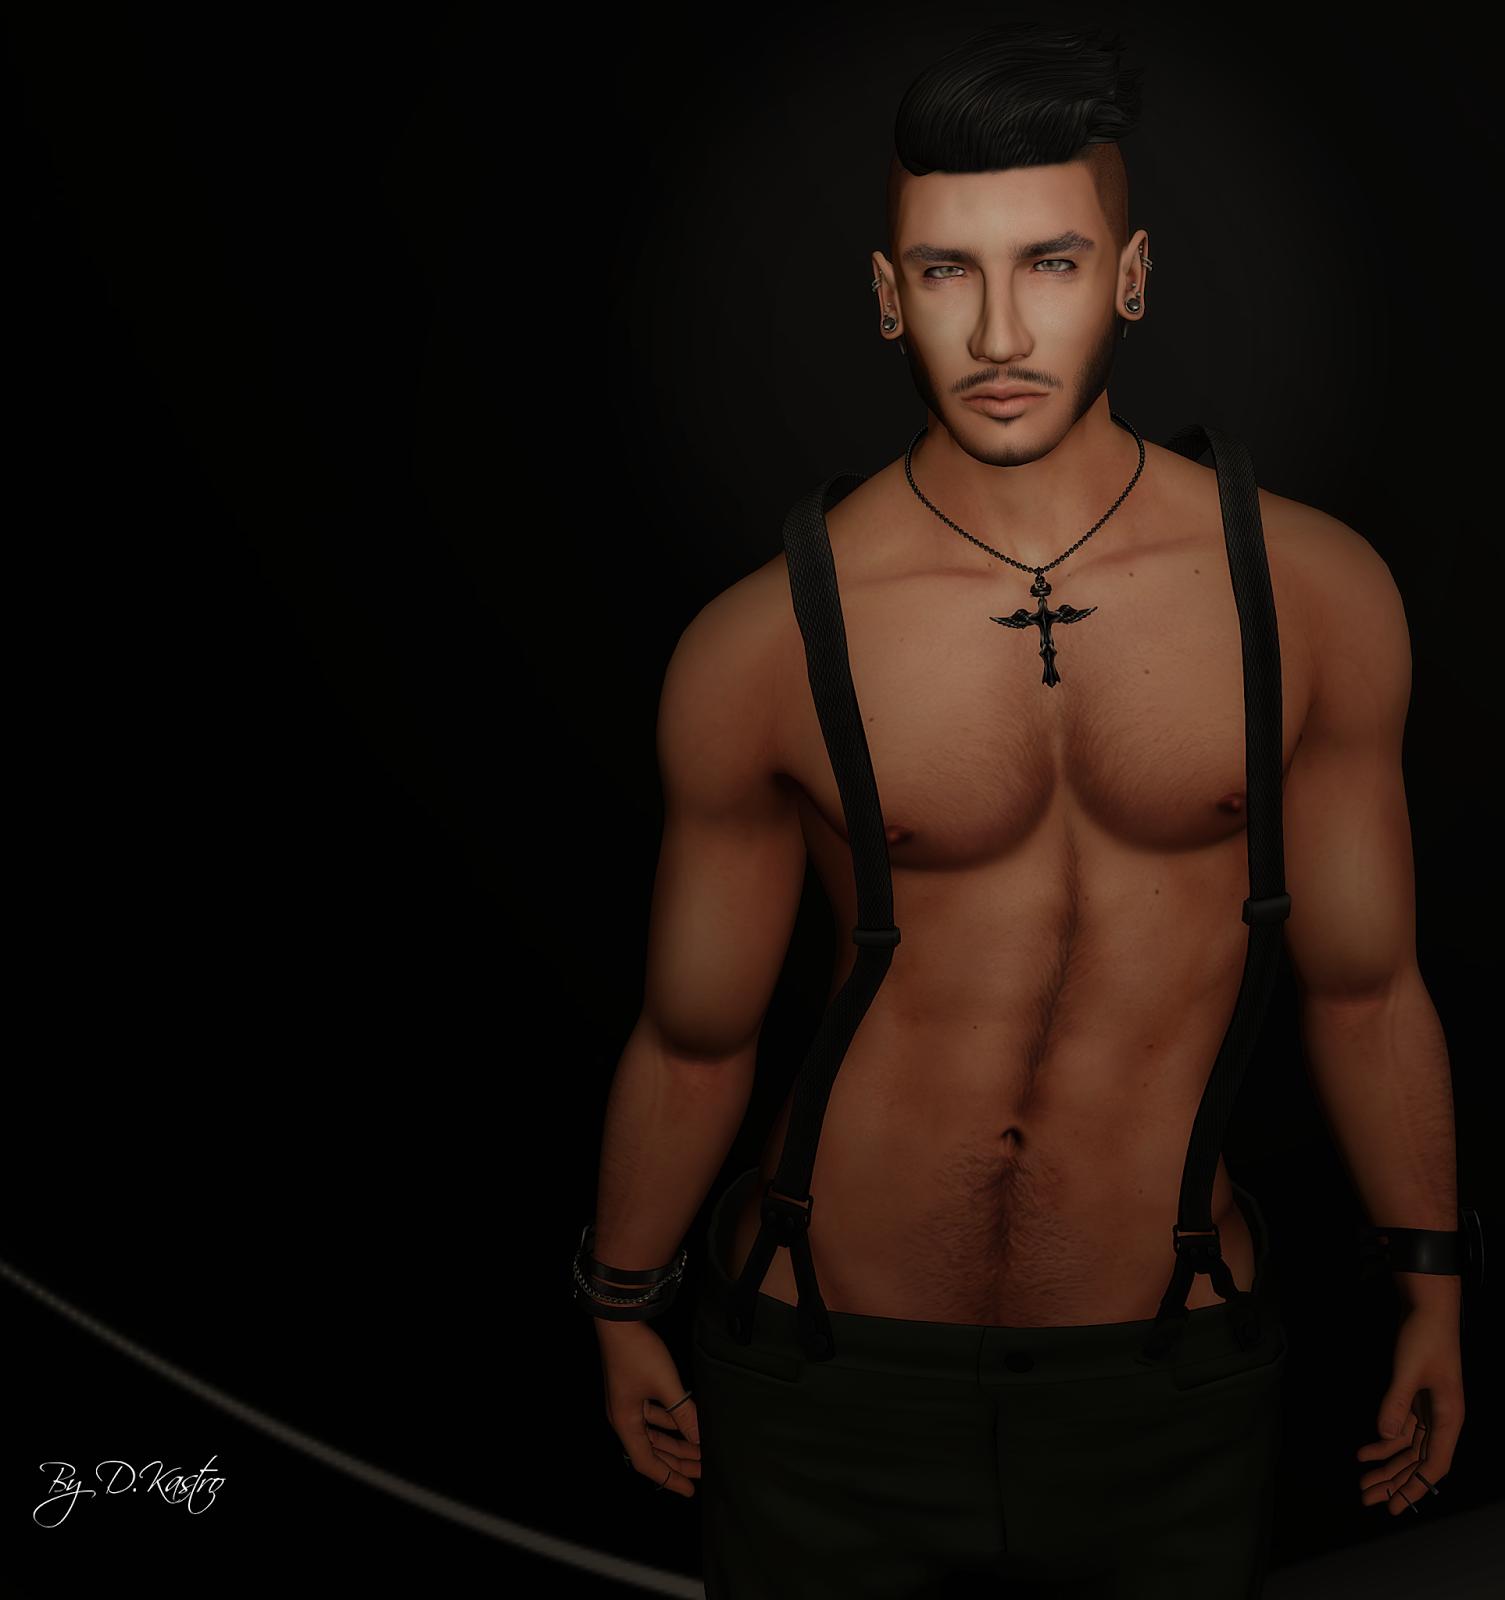 Bring Me To Life by stefangrosjean on DeviantArt